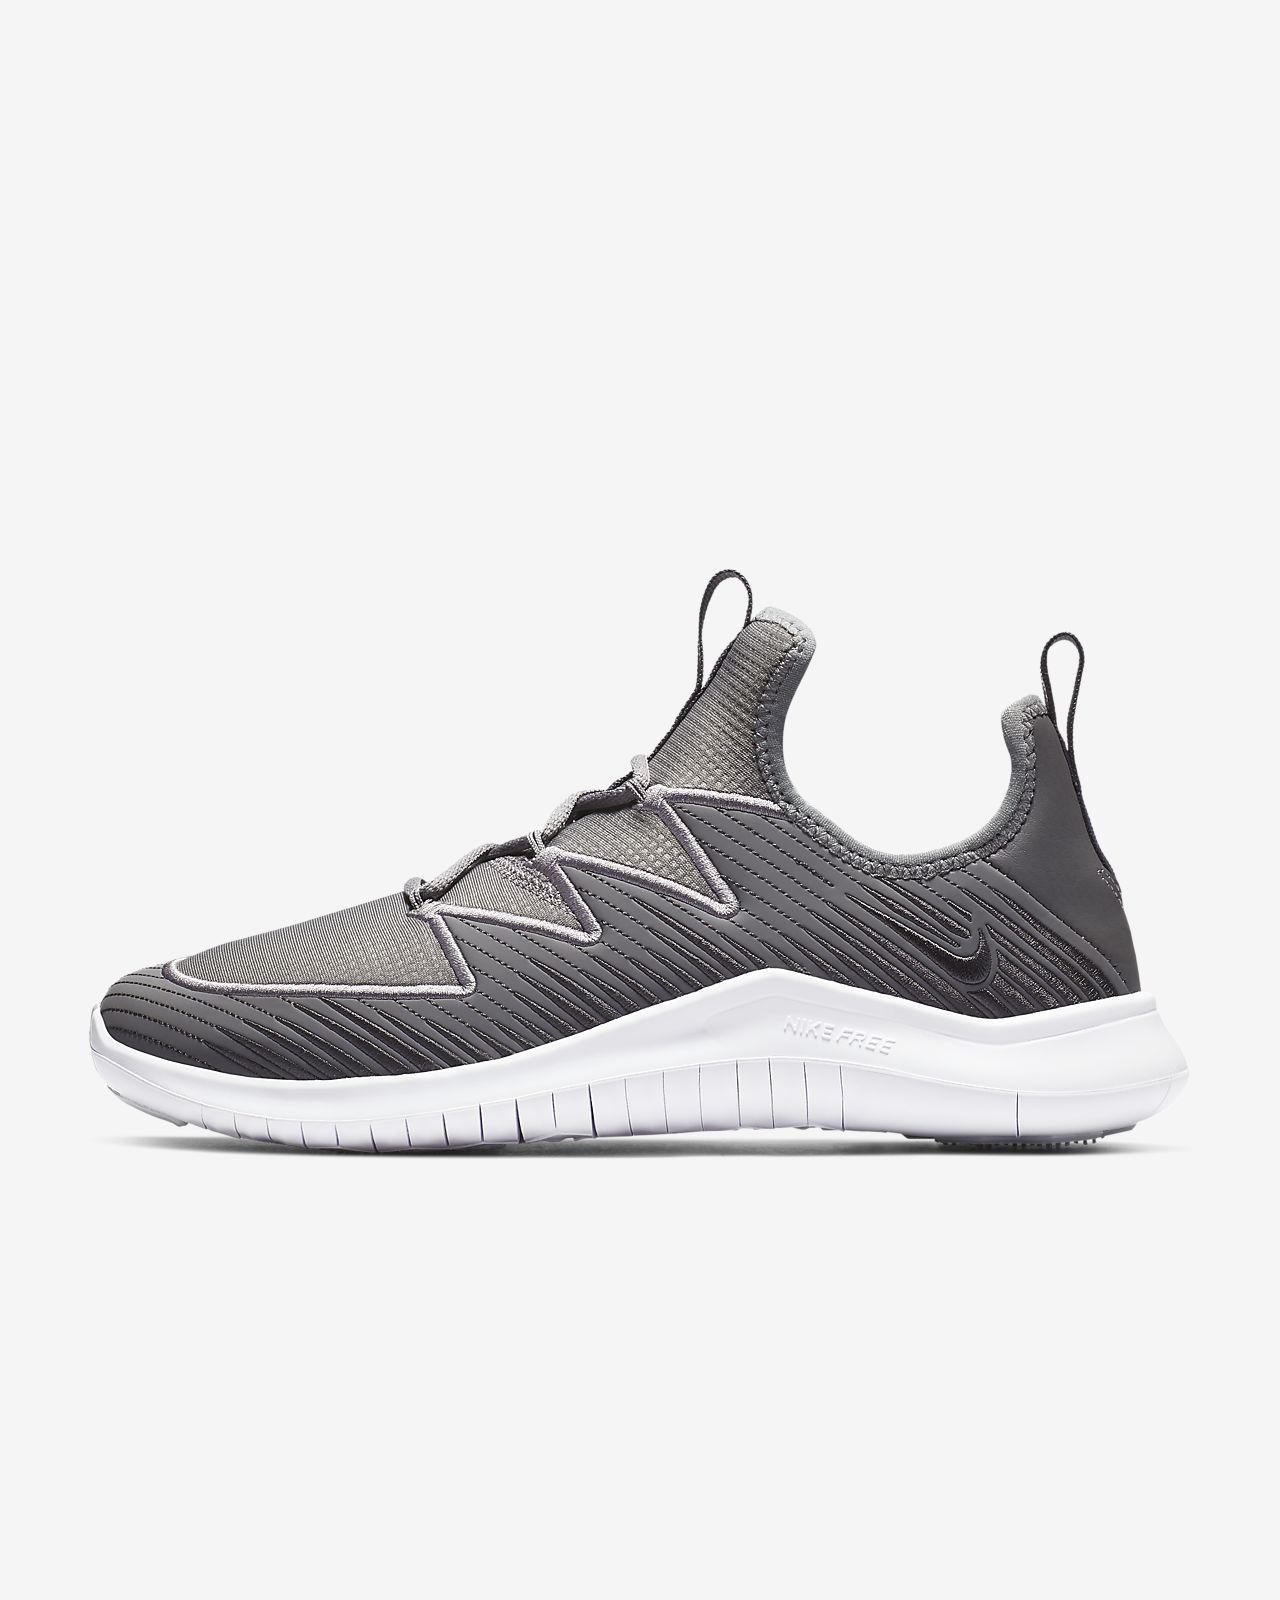 hot sale online 7a543 ef7cd ... Chaussure de training Nike Free TR Ultra pour Femme